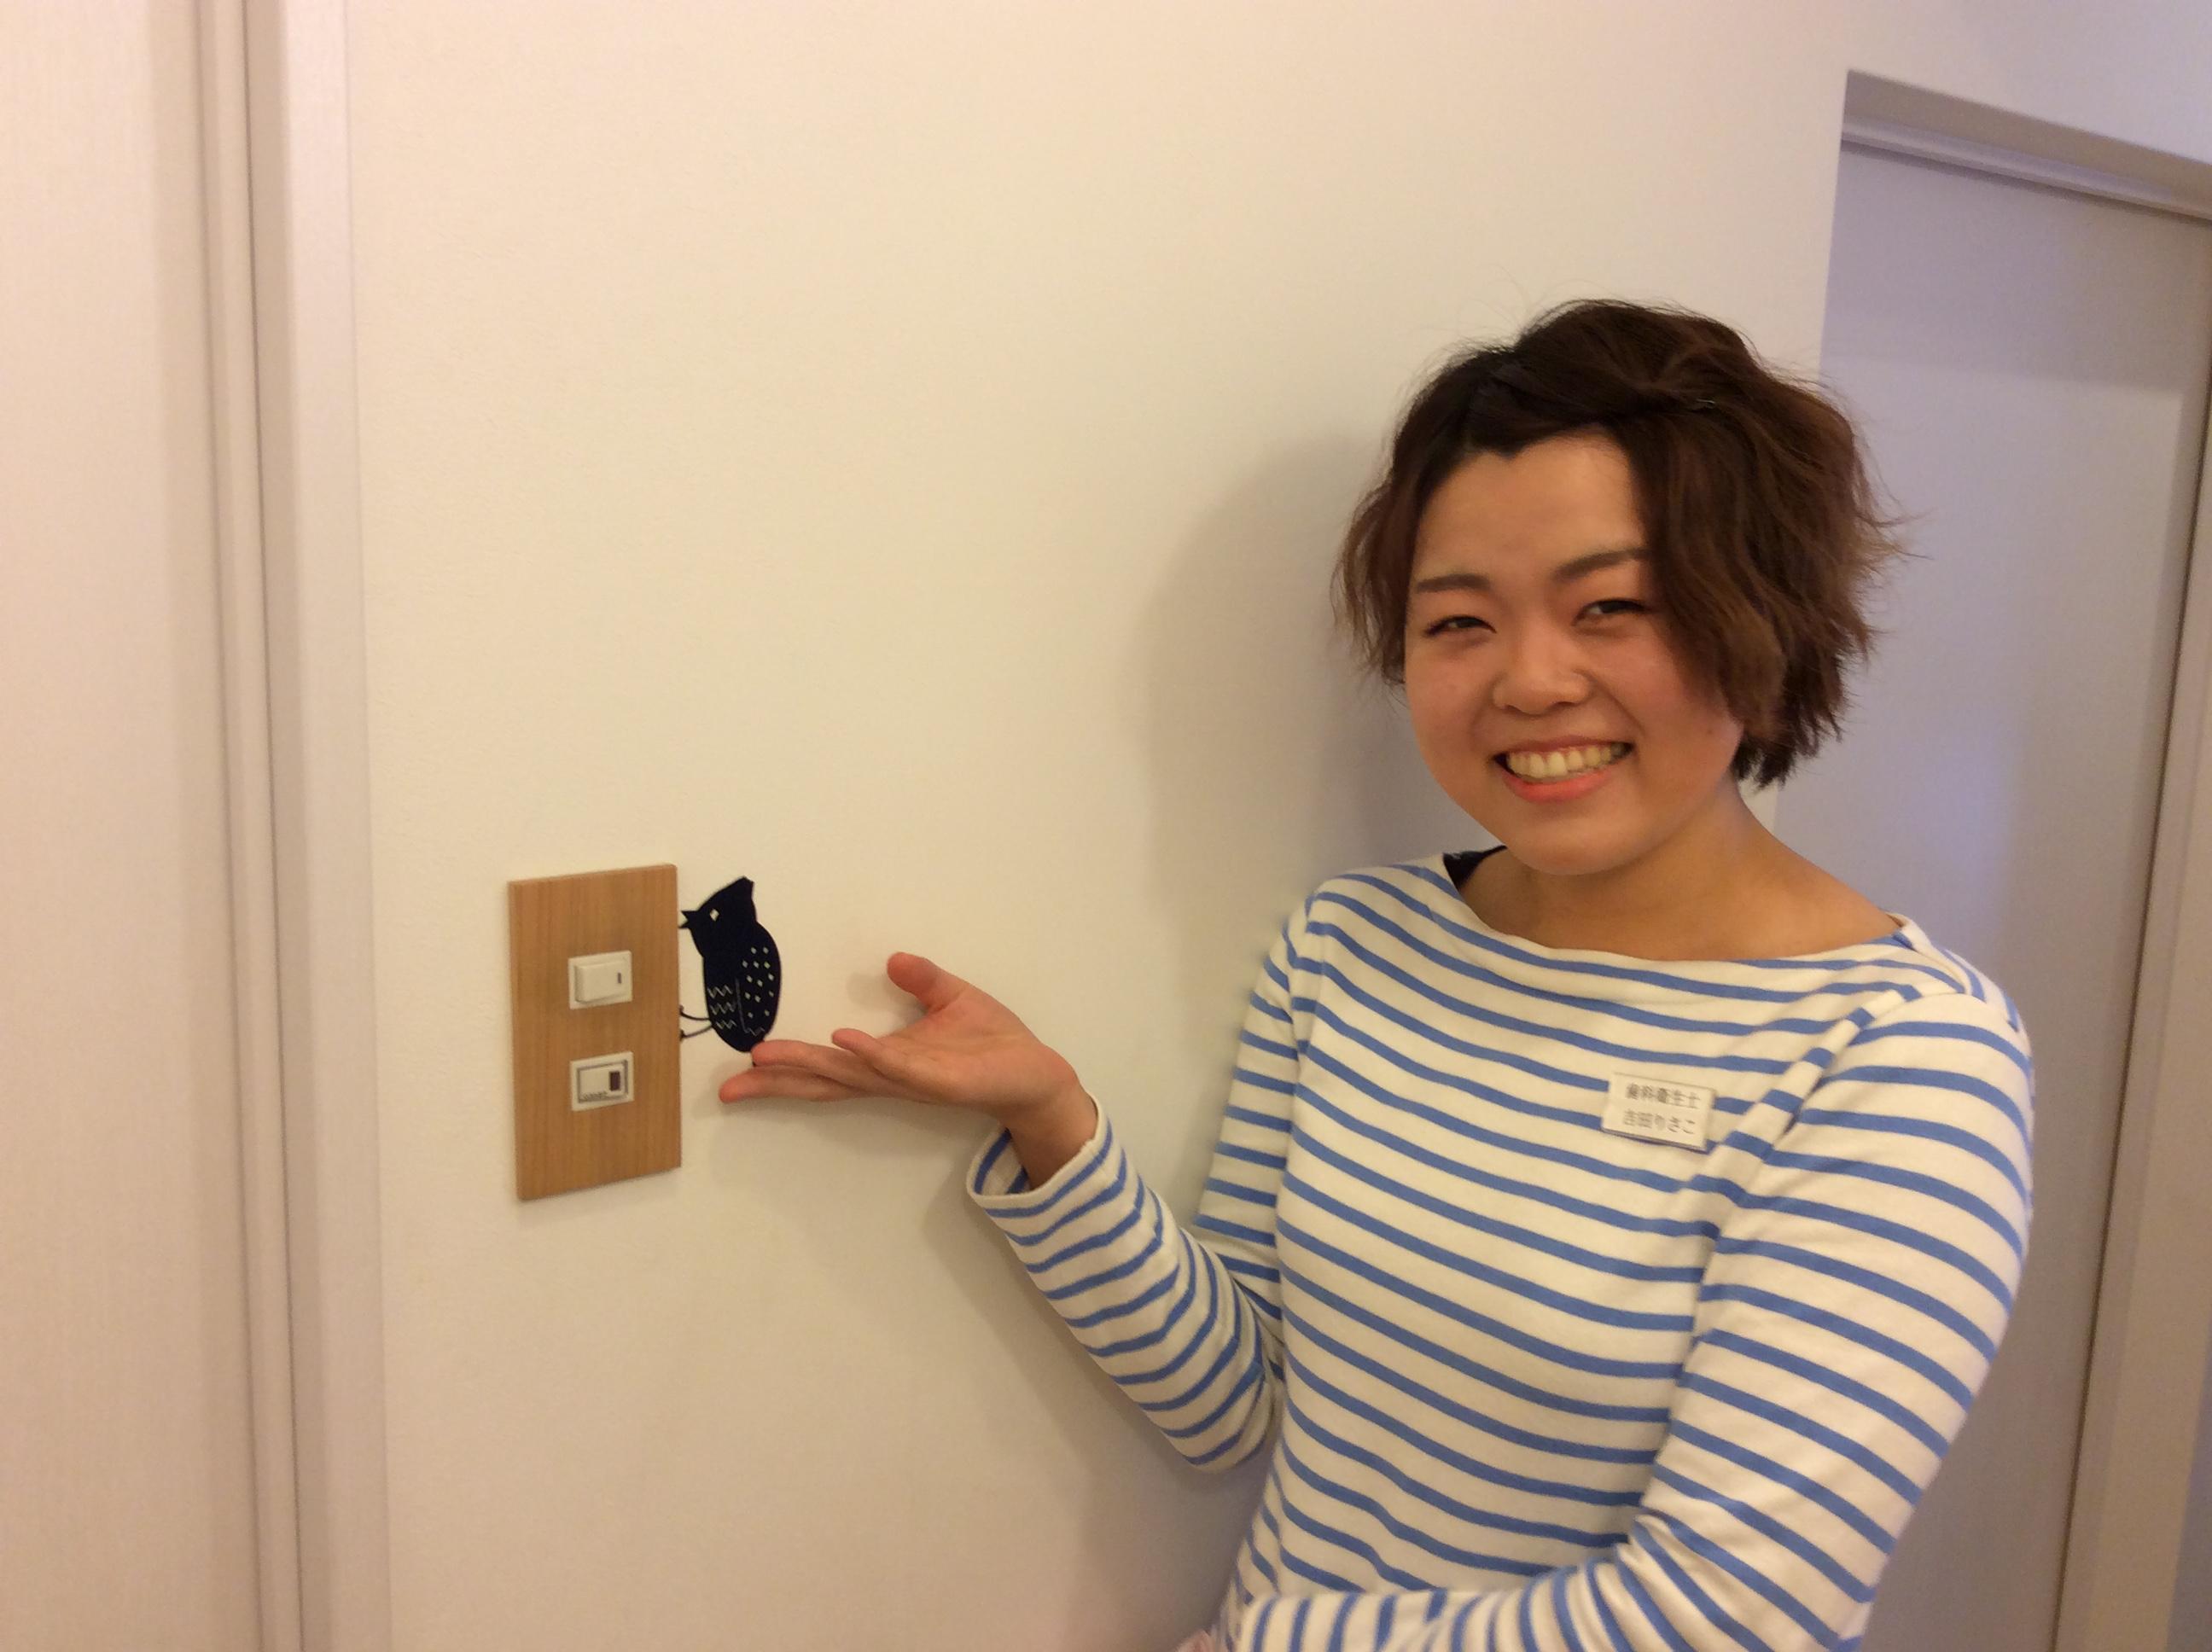 http://www.kunitachi-kodomo.com/blog/staff/images/image1.JPG